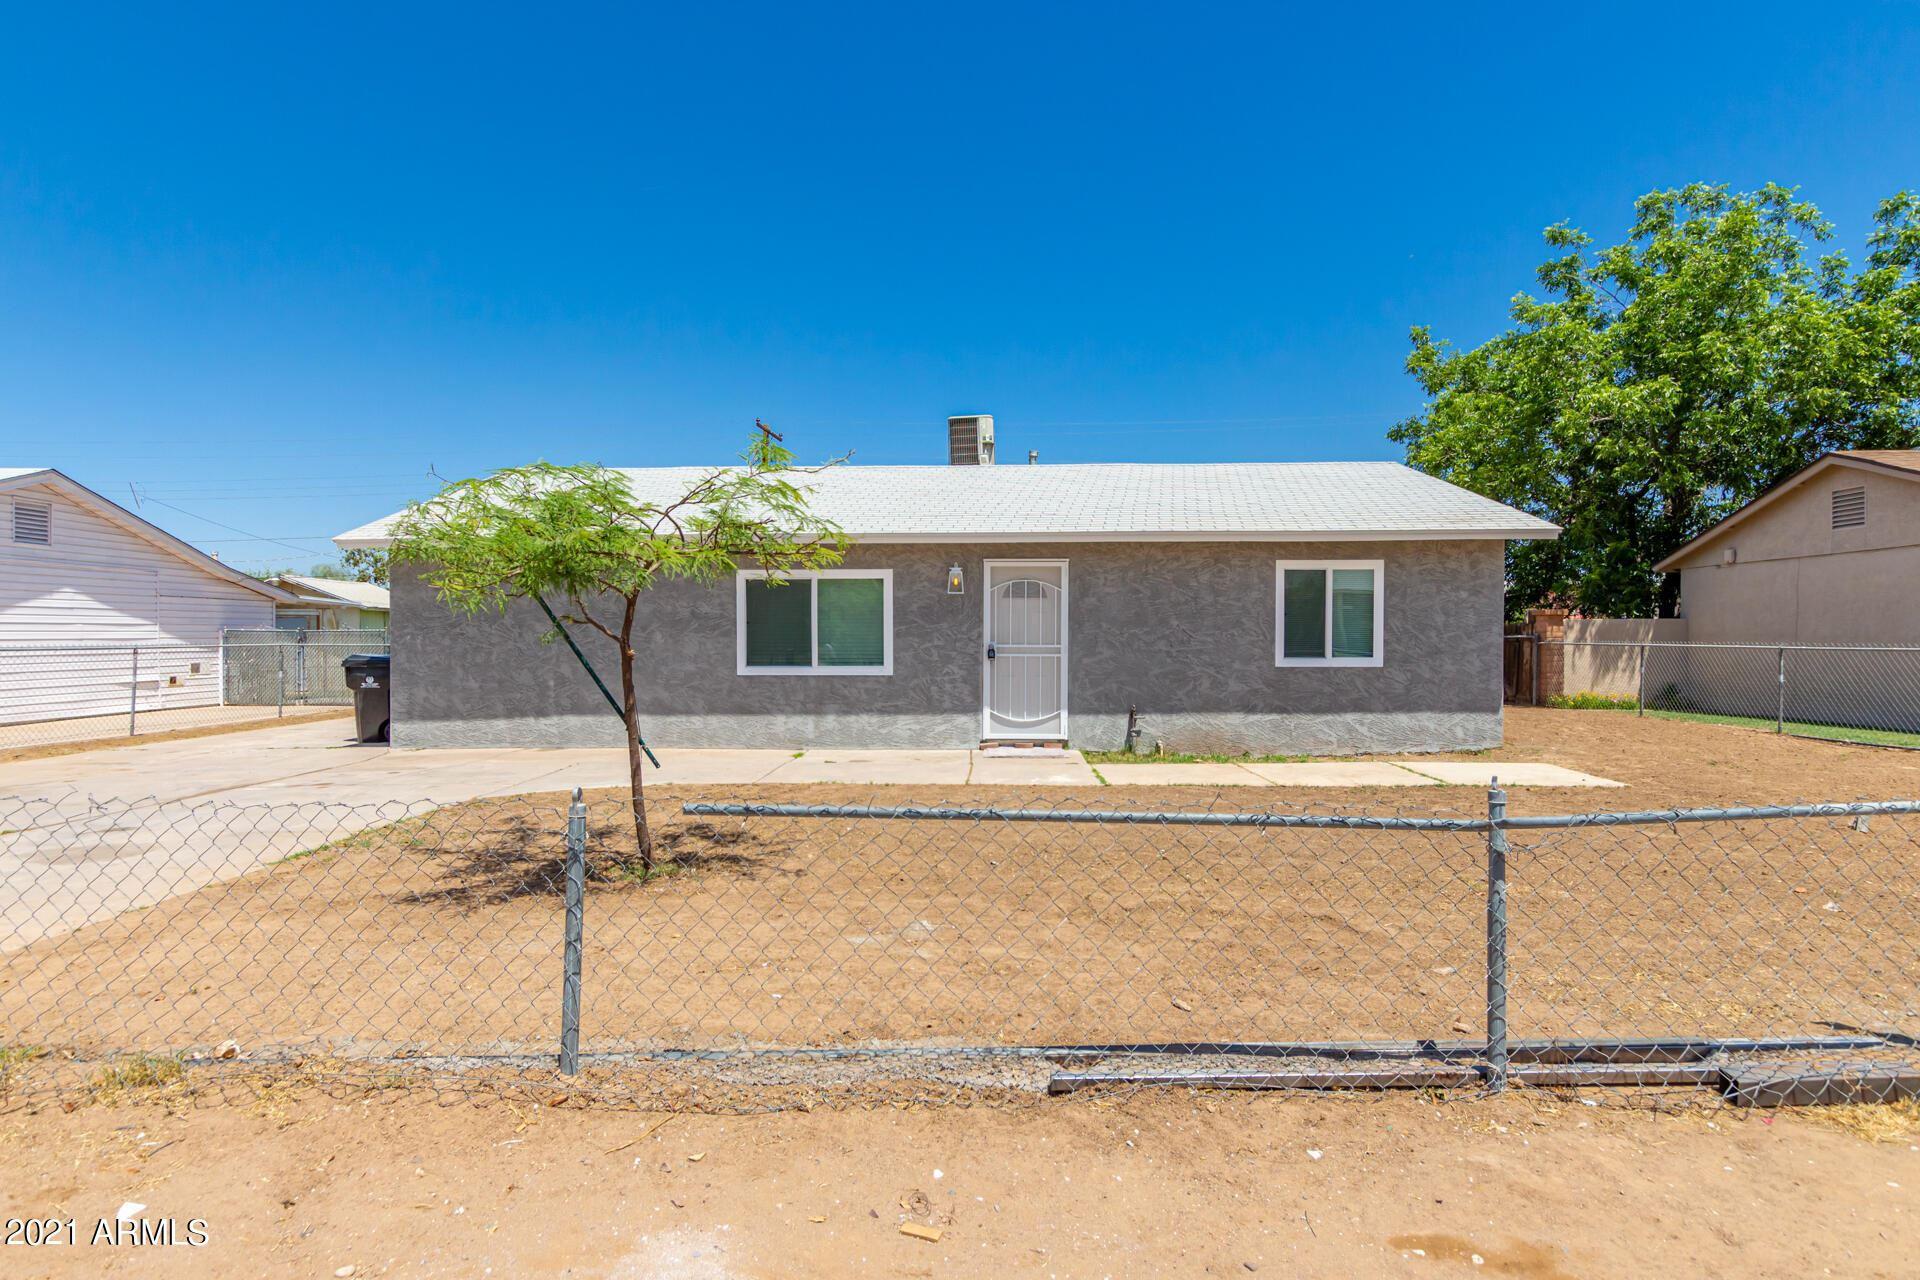 3928 W BURGESS Lane, Phoenix, AZ 85041 - MLS#: 6234783